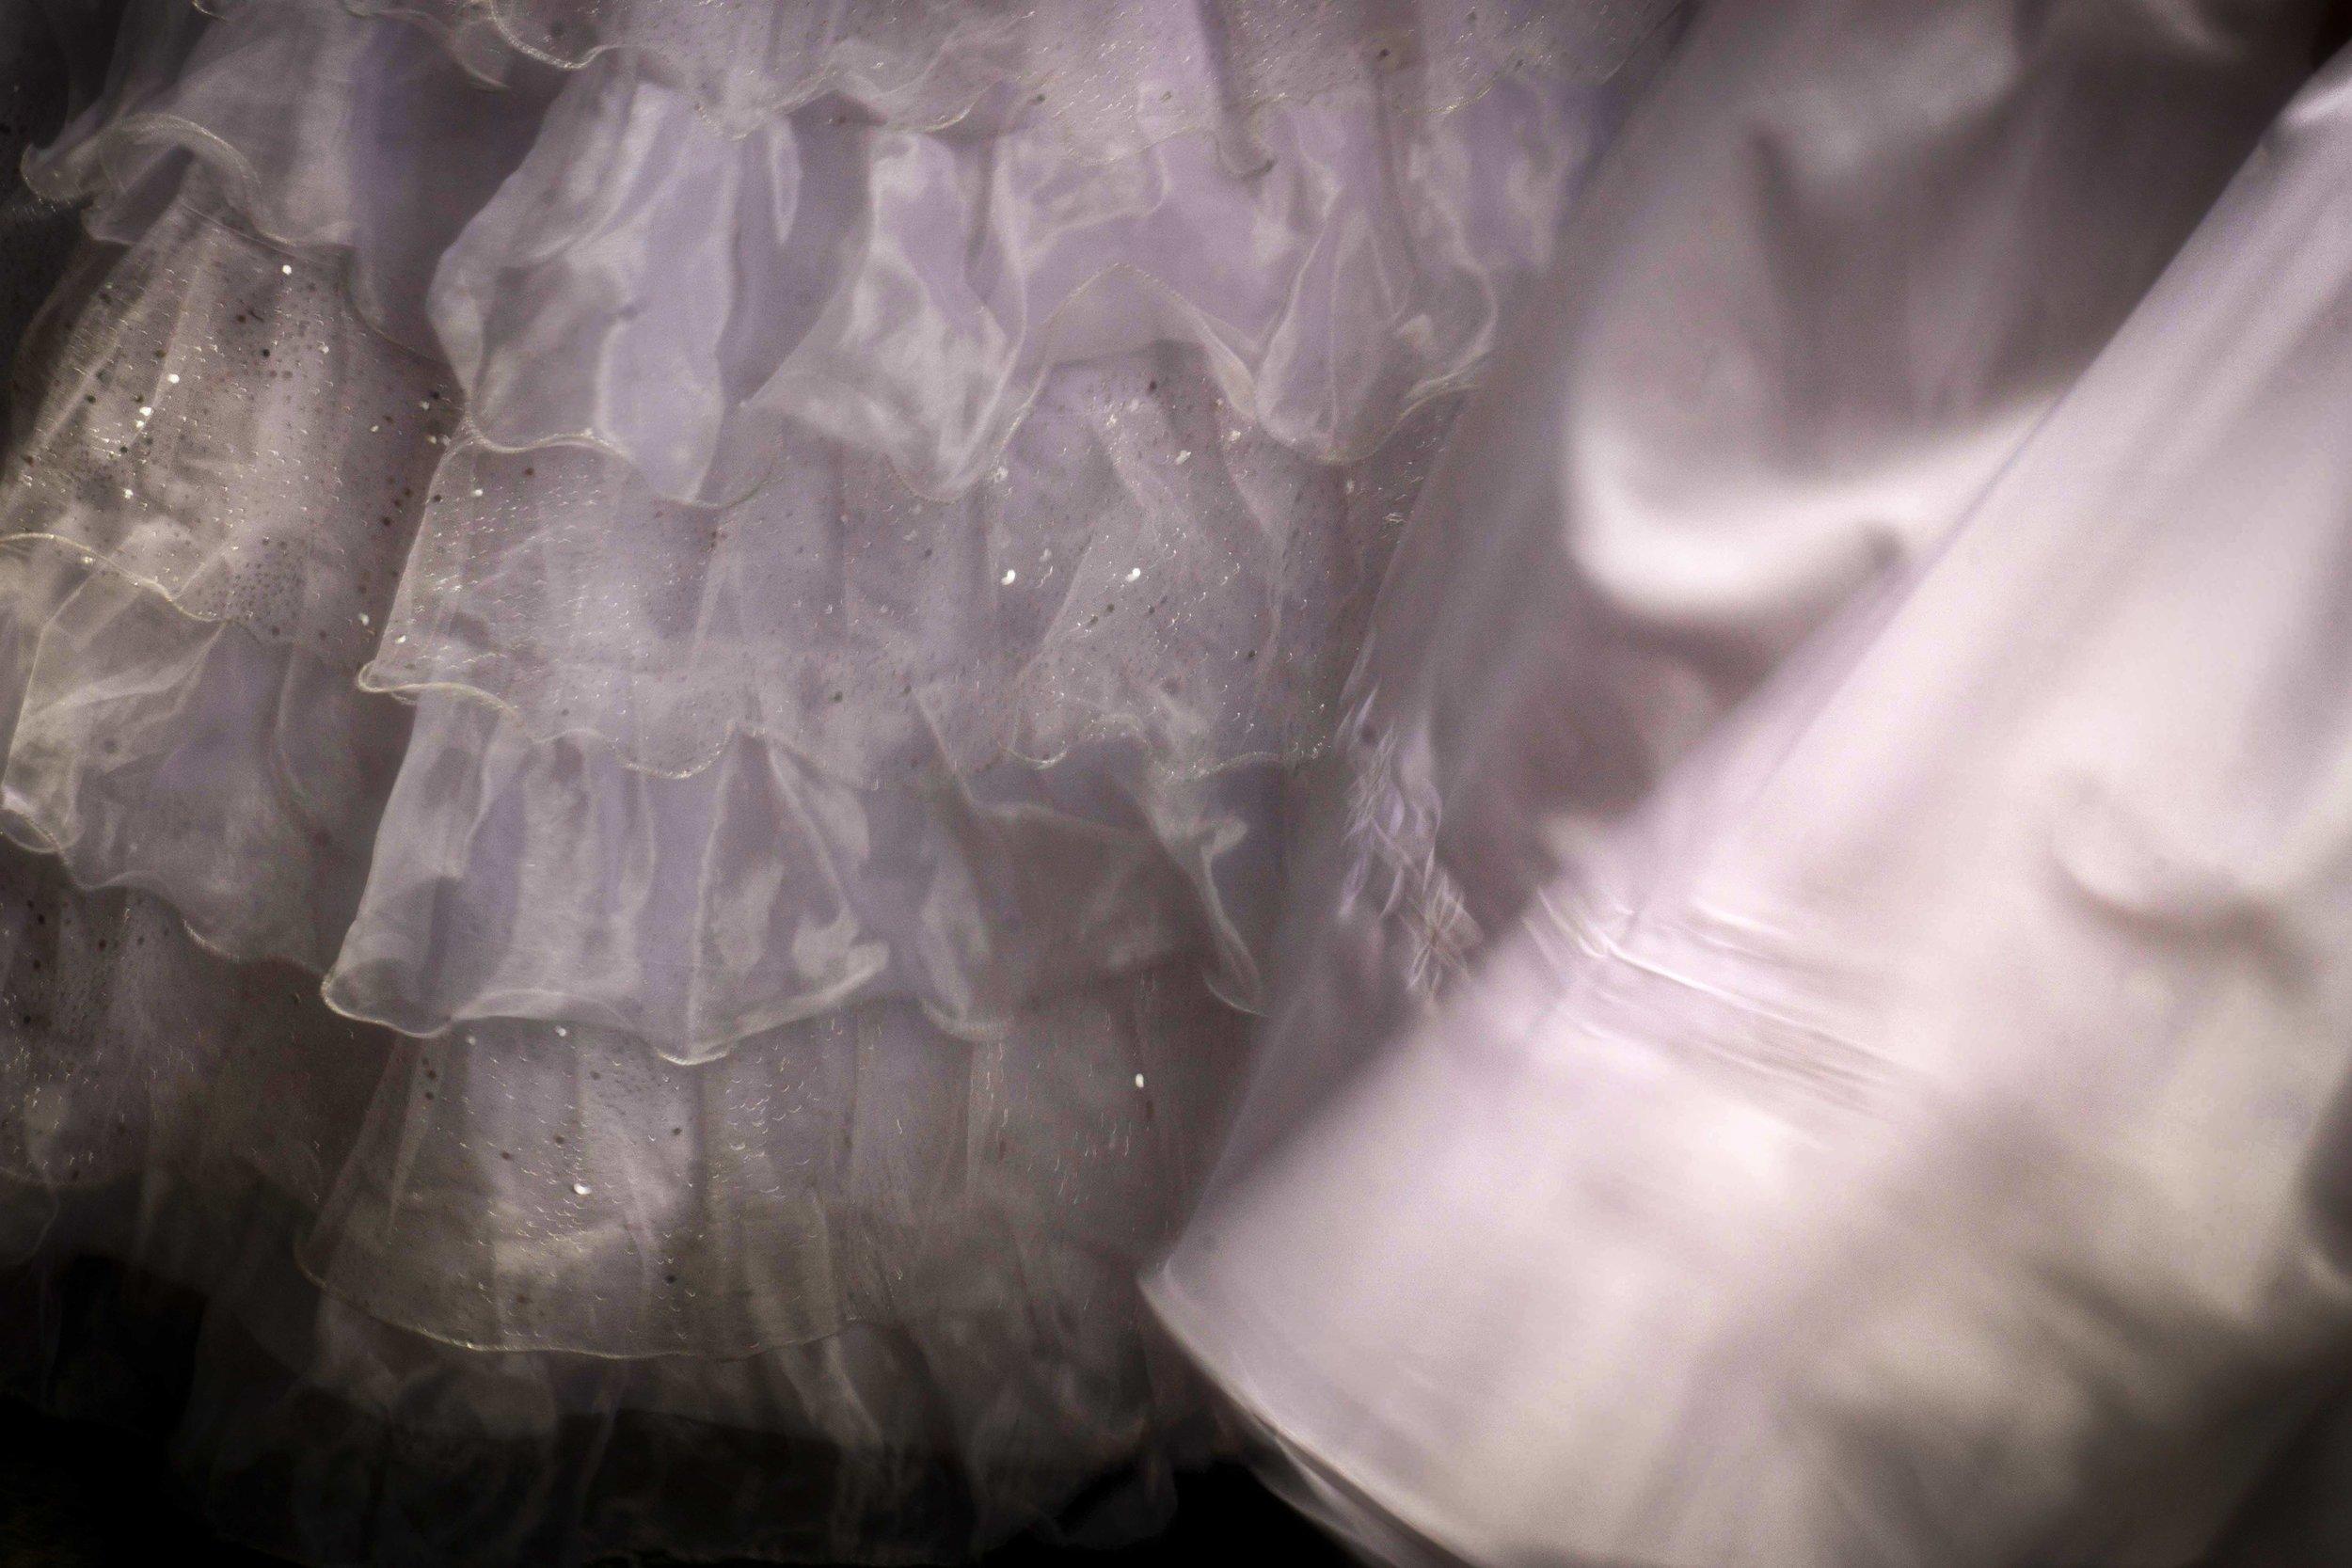 Pale pink skirts vignetted DSC01884_1.jpg